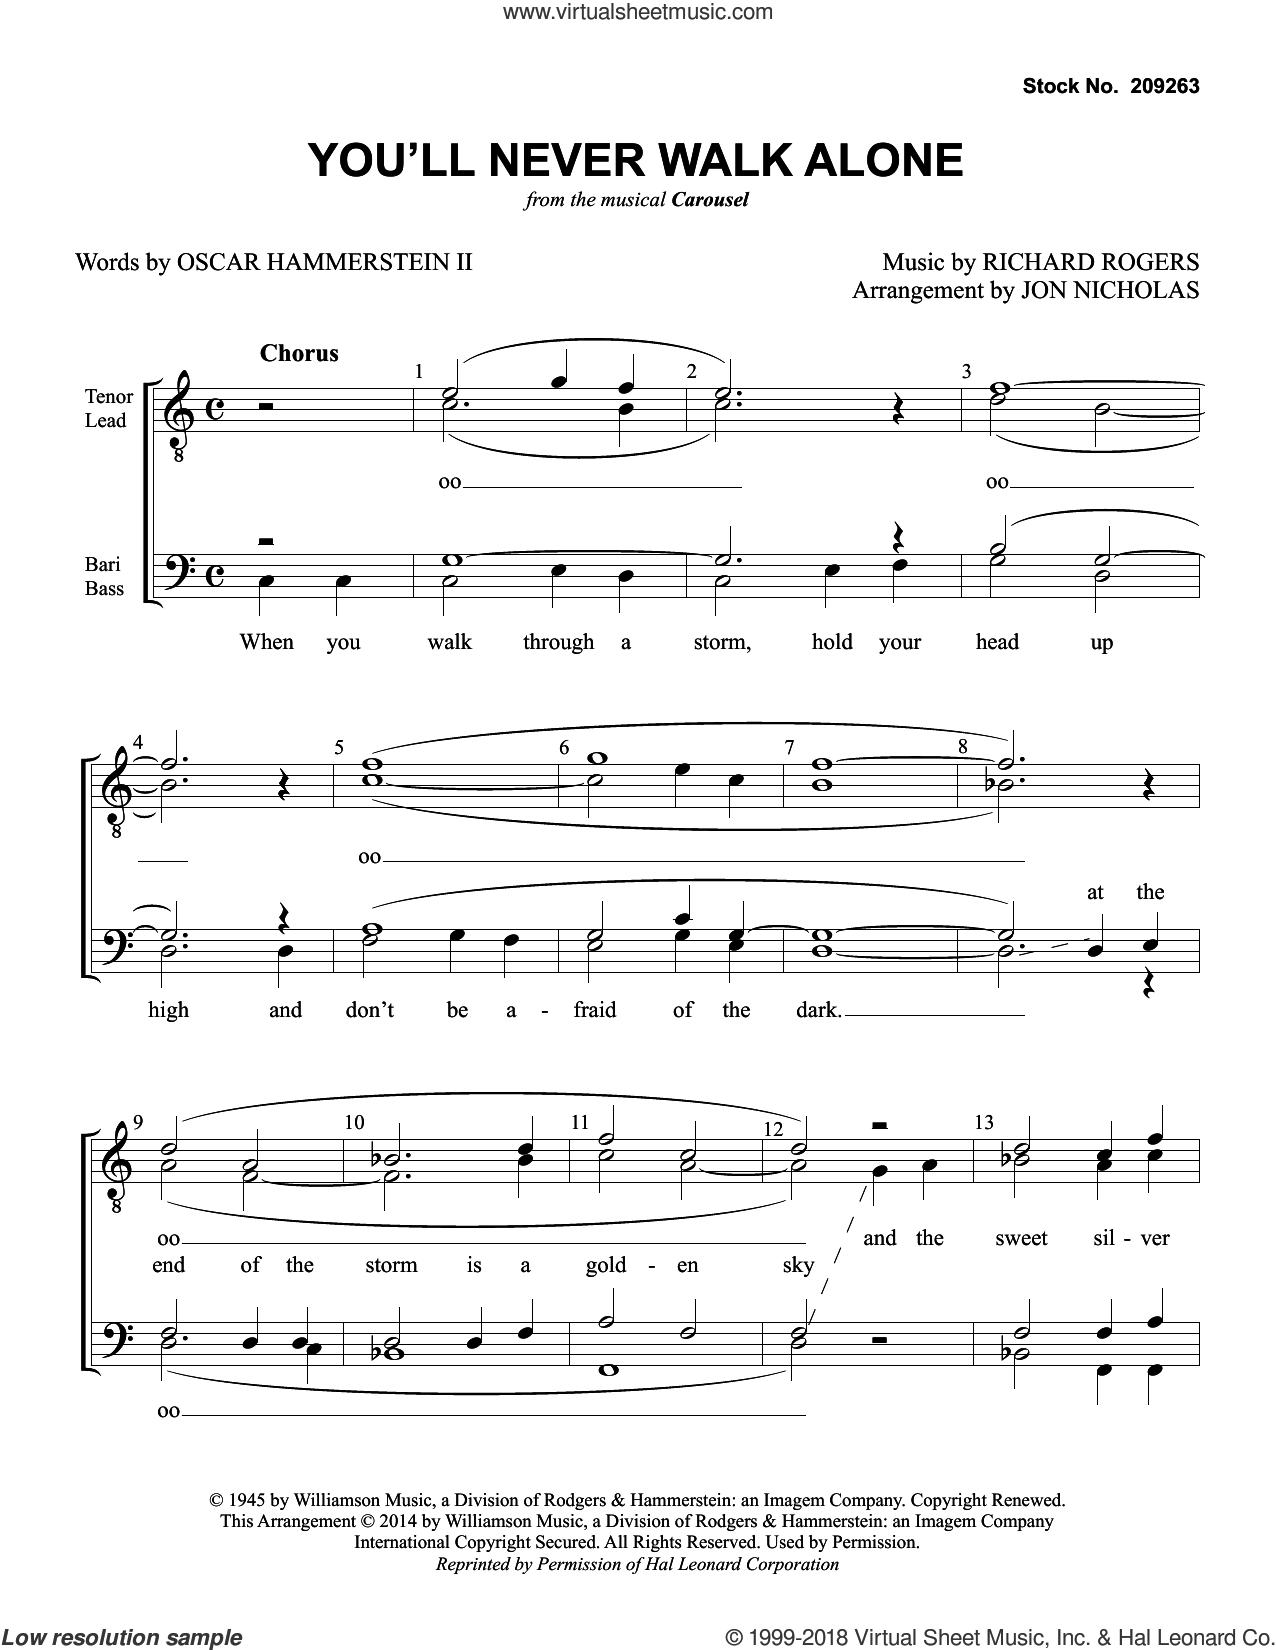 You'll Never Walk Alone (from Carousel) (arr. Jon Nicholas) sheet music for choir (TTBB: tenor, bass) by Rodgers & Hammerstein, Jon Nicholas, Oscar II Hammerstein and Richard Rodgers, intermediate skill level